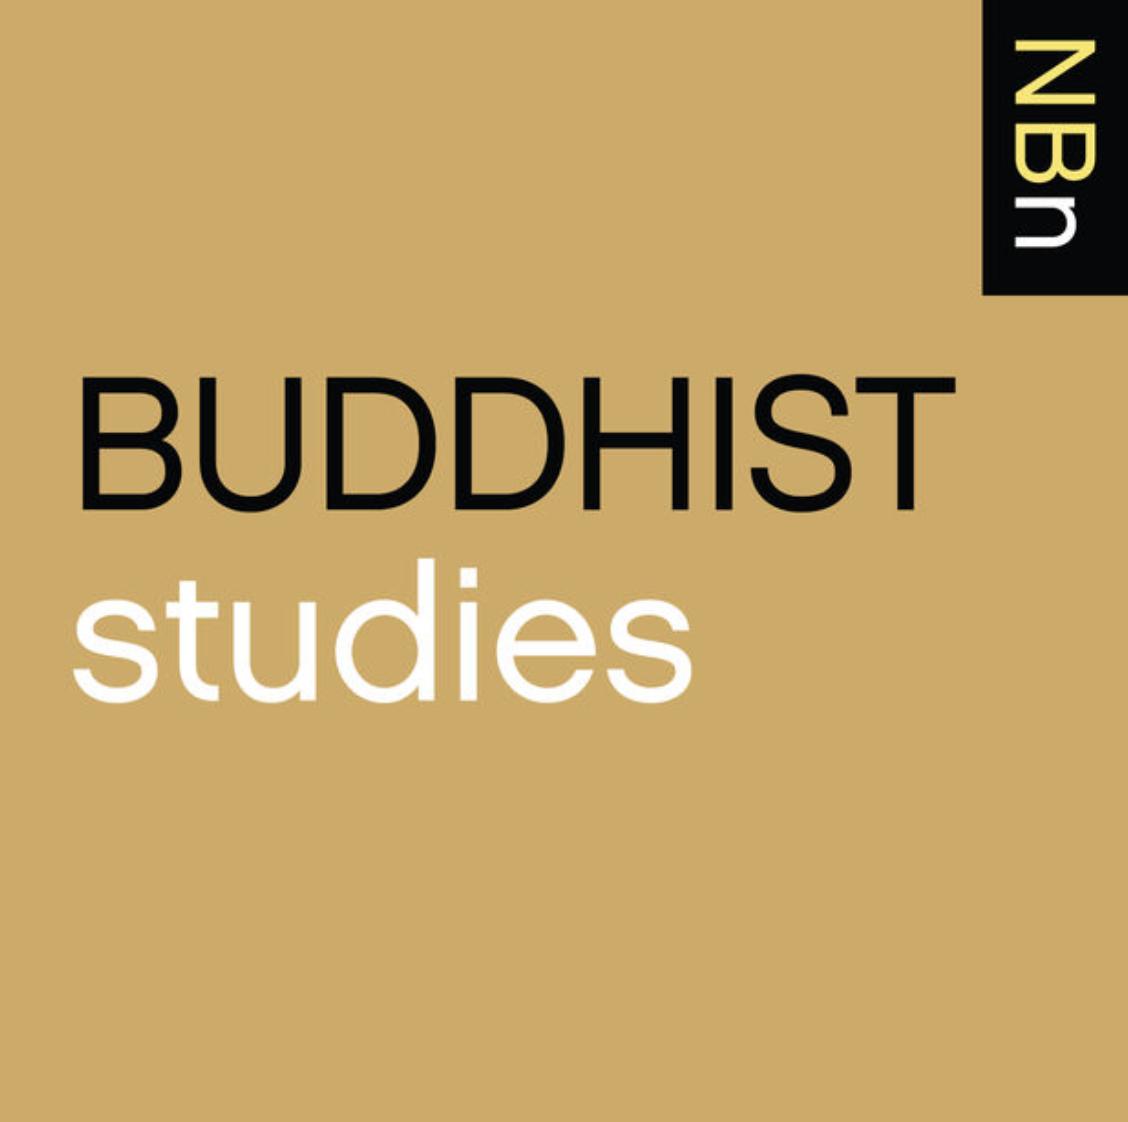 NEW BOOKS IN BUDDHIST STUDIES